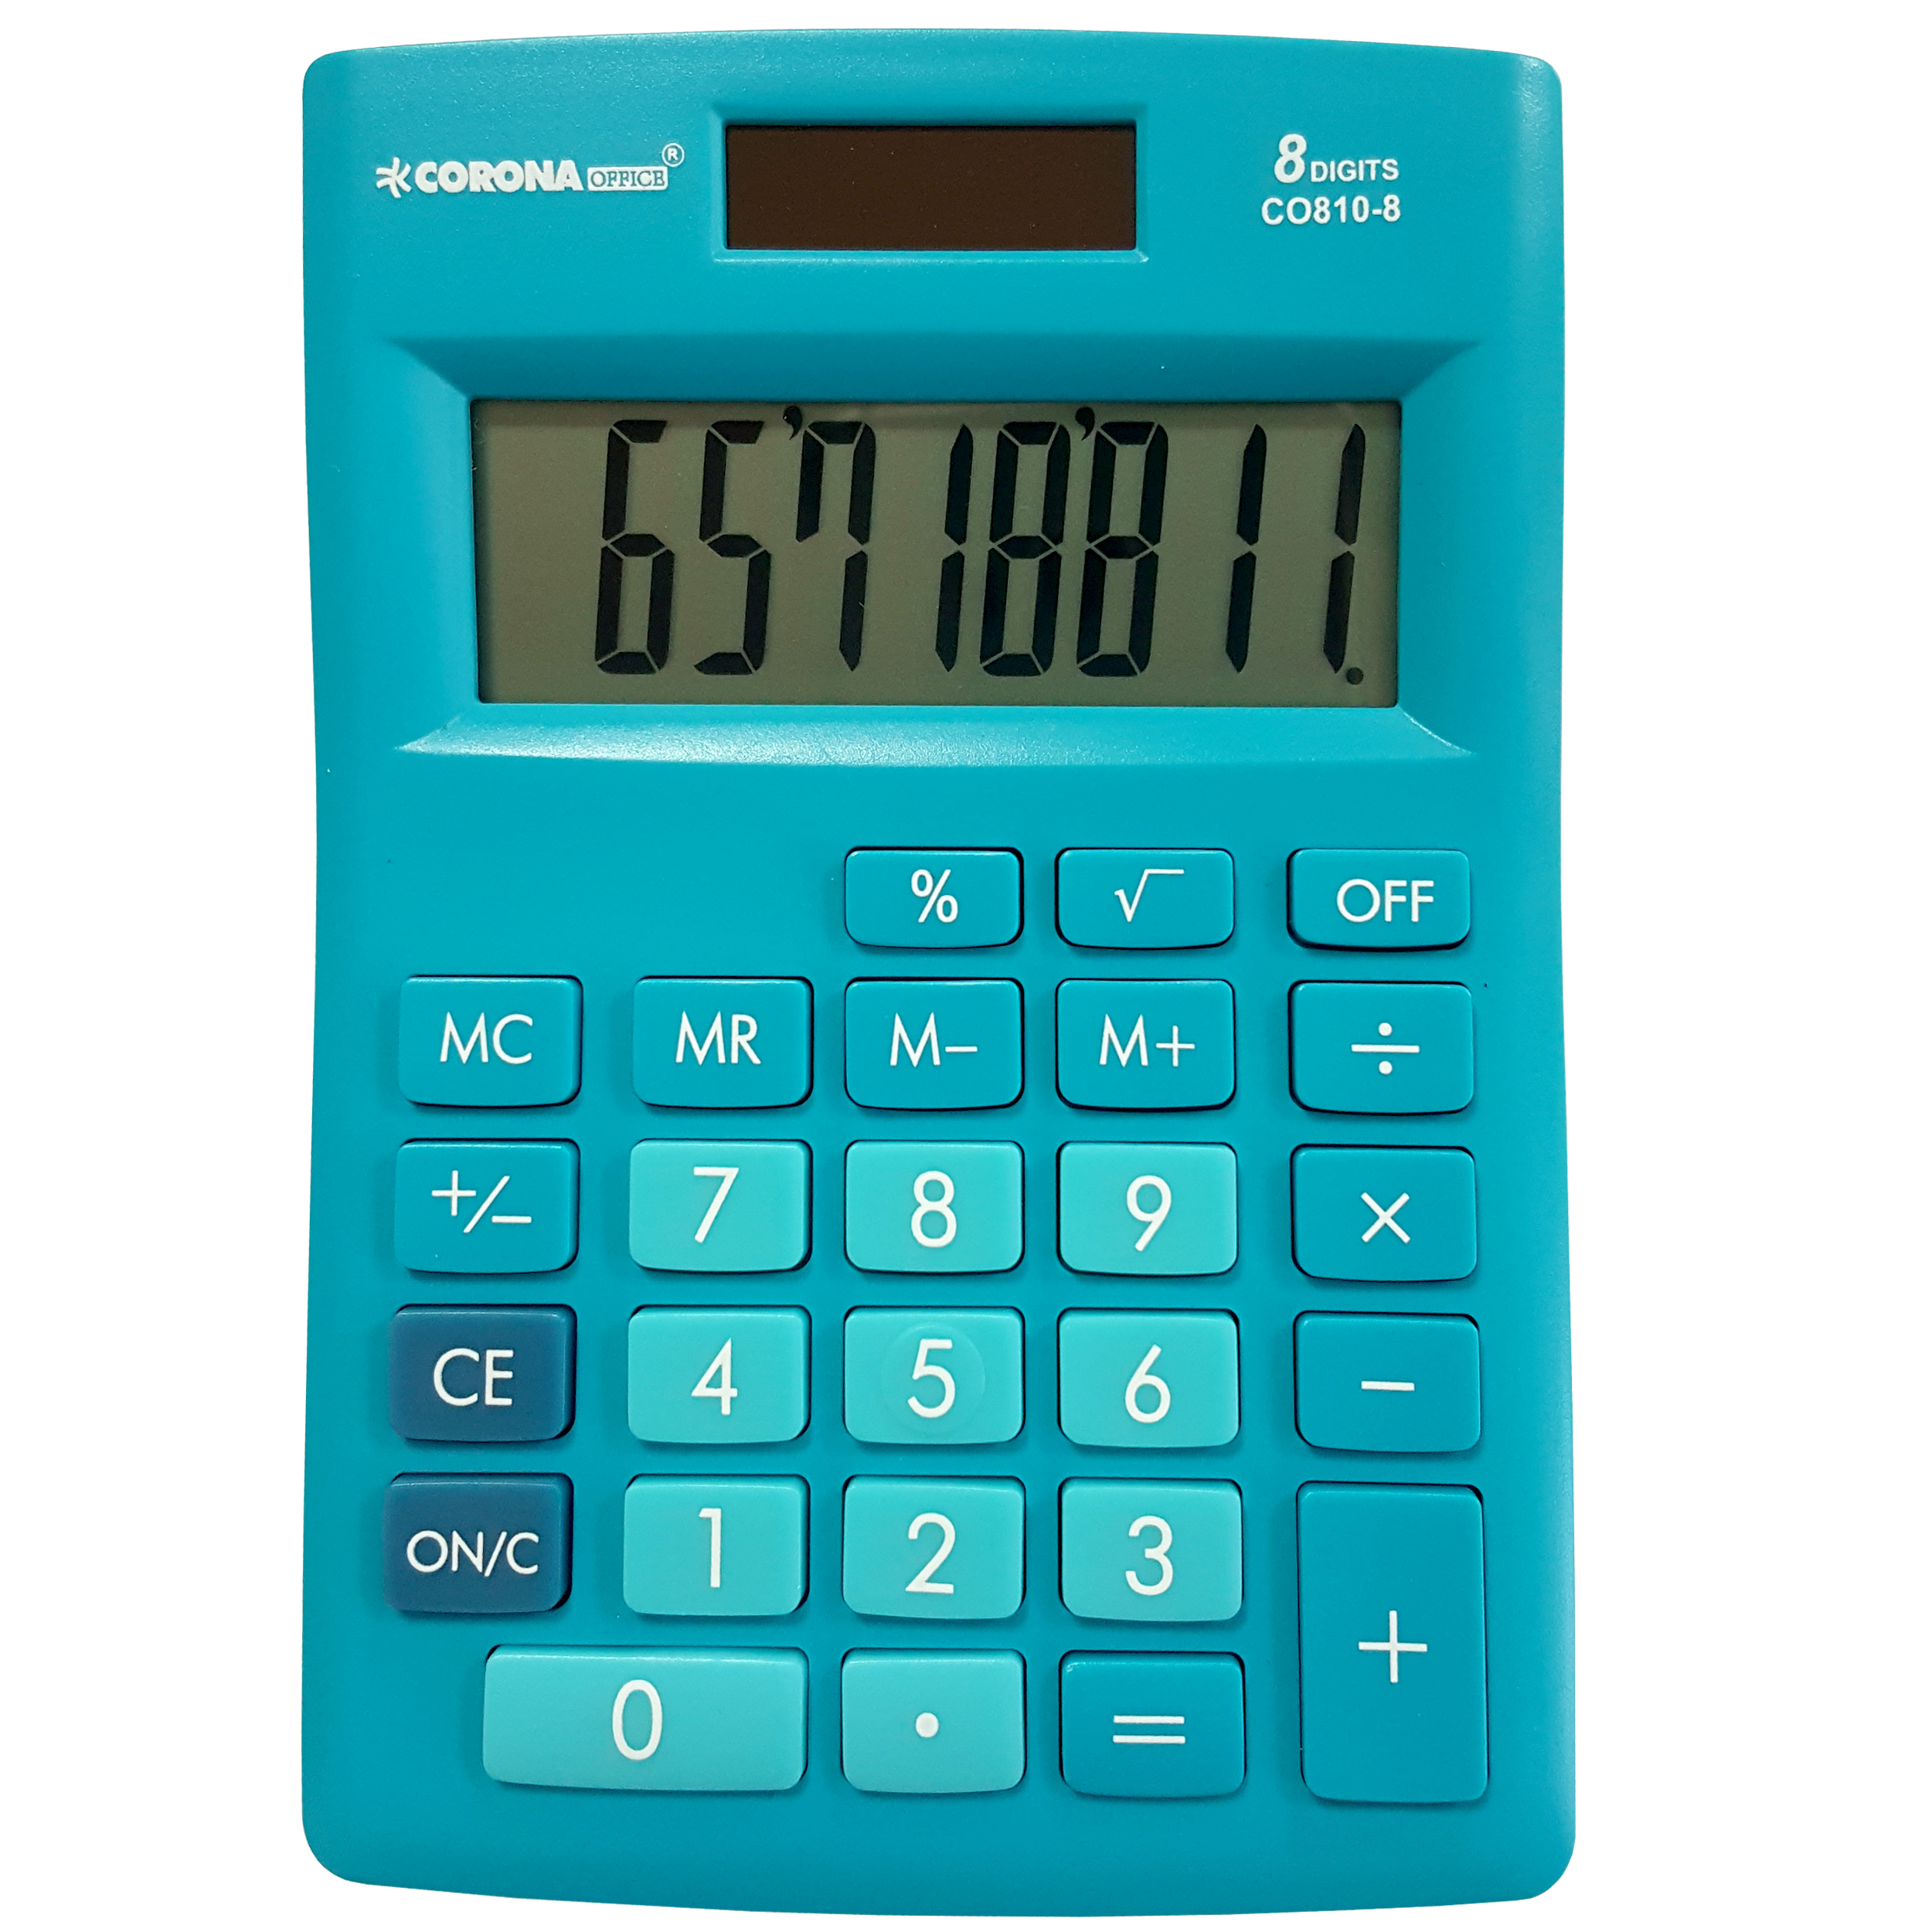 ماشین حساب کرونا آفیس مدل CO810-8